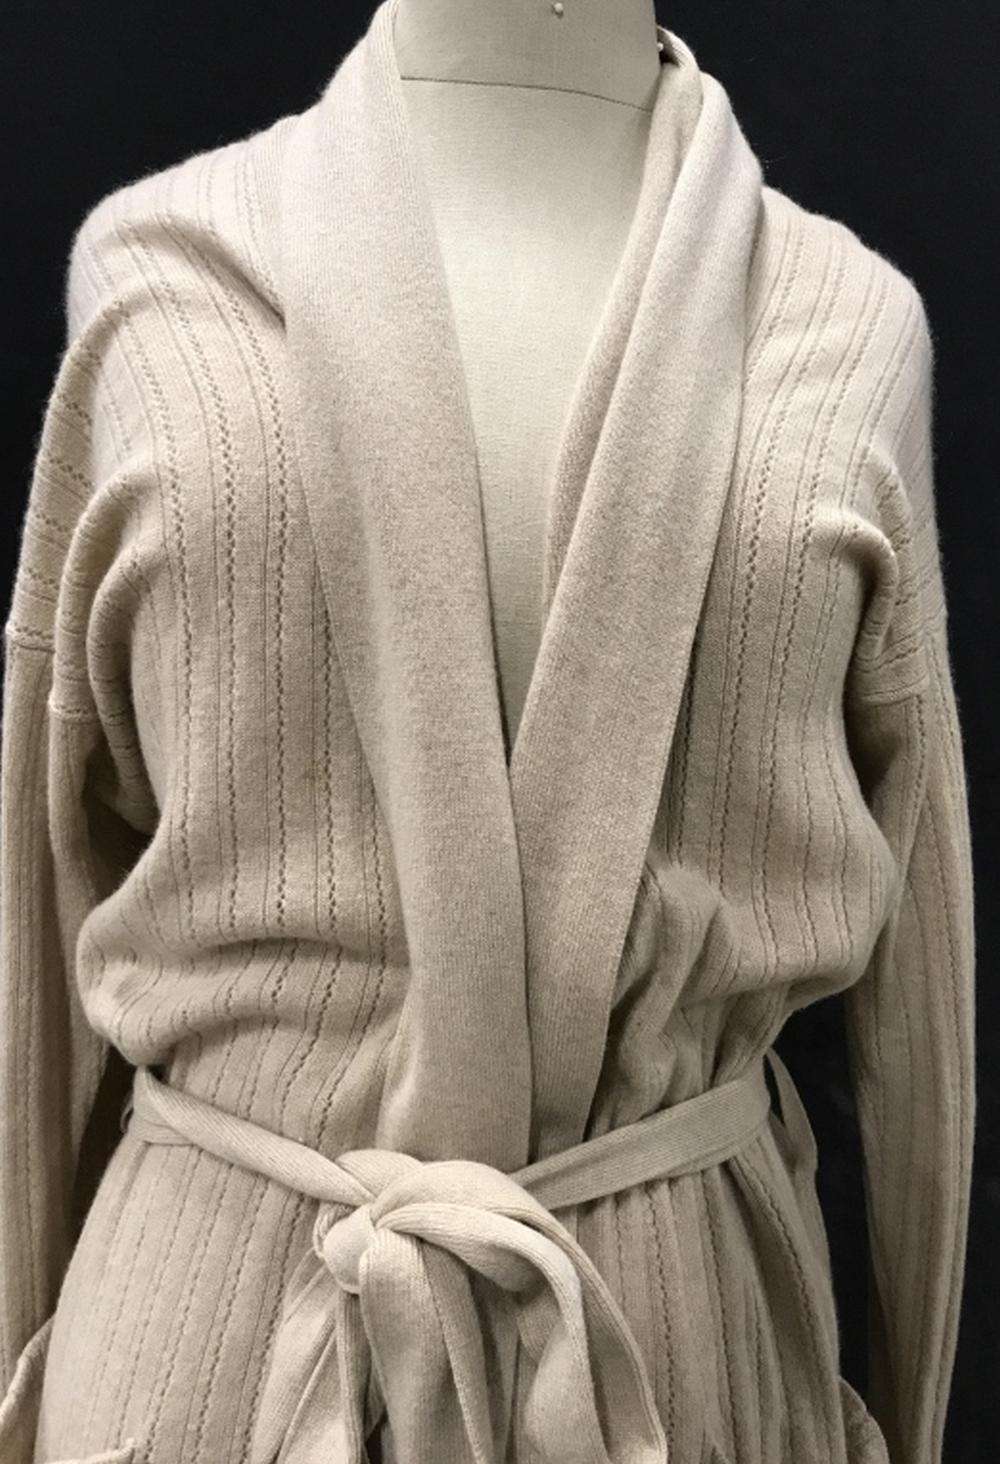 TSE CASHMERE Camel colored Sweater Jacket